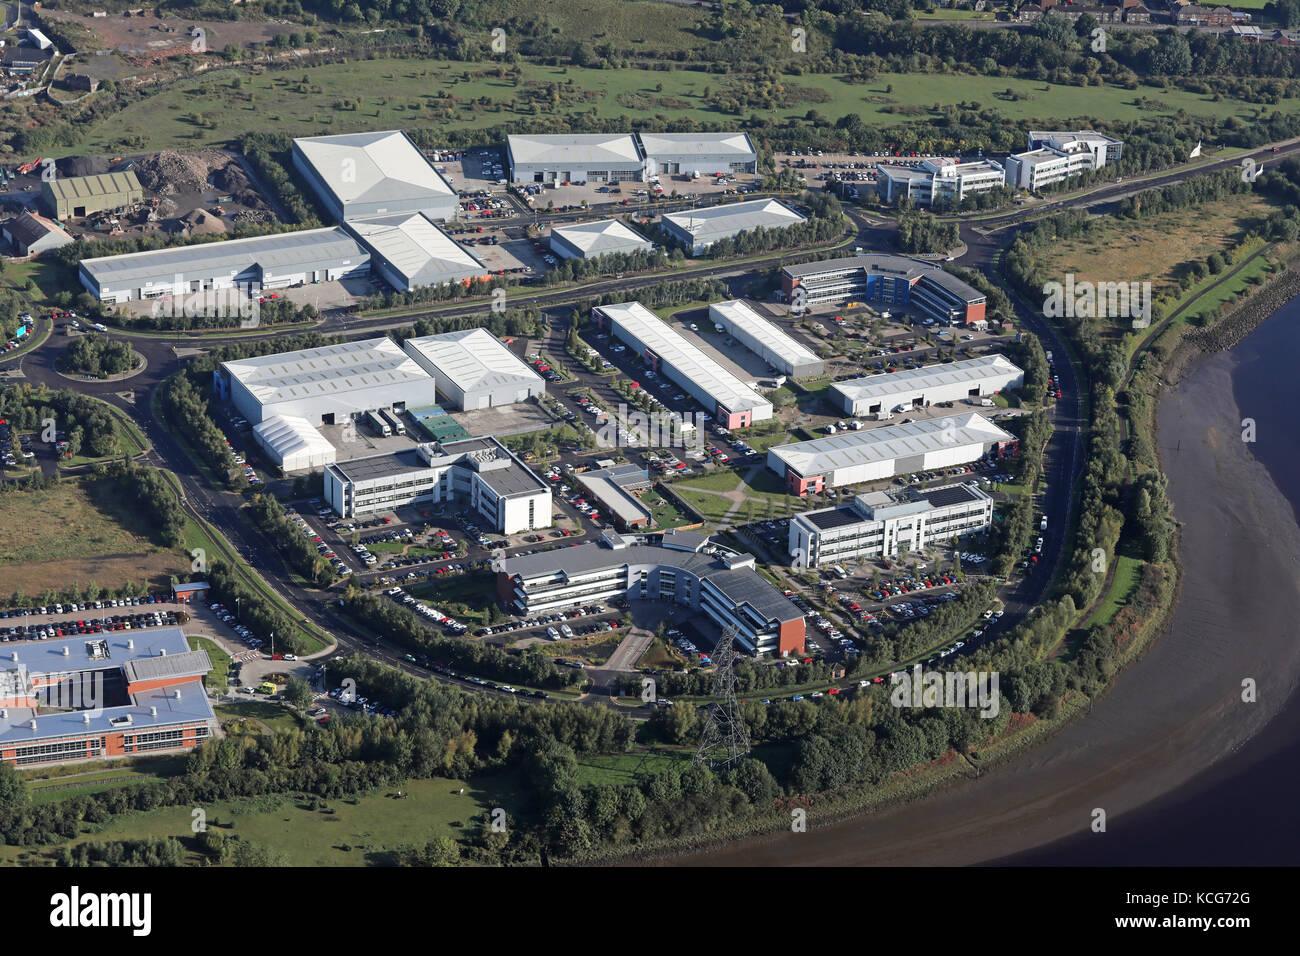 aerial view of Newburn Riverside Park, Newcastle upon Tyne, UK - Stock Image